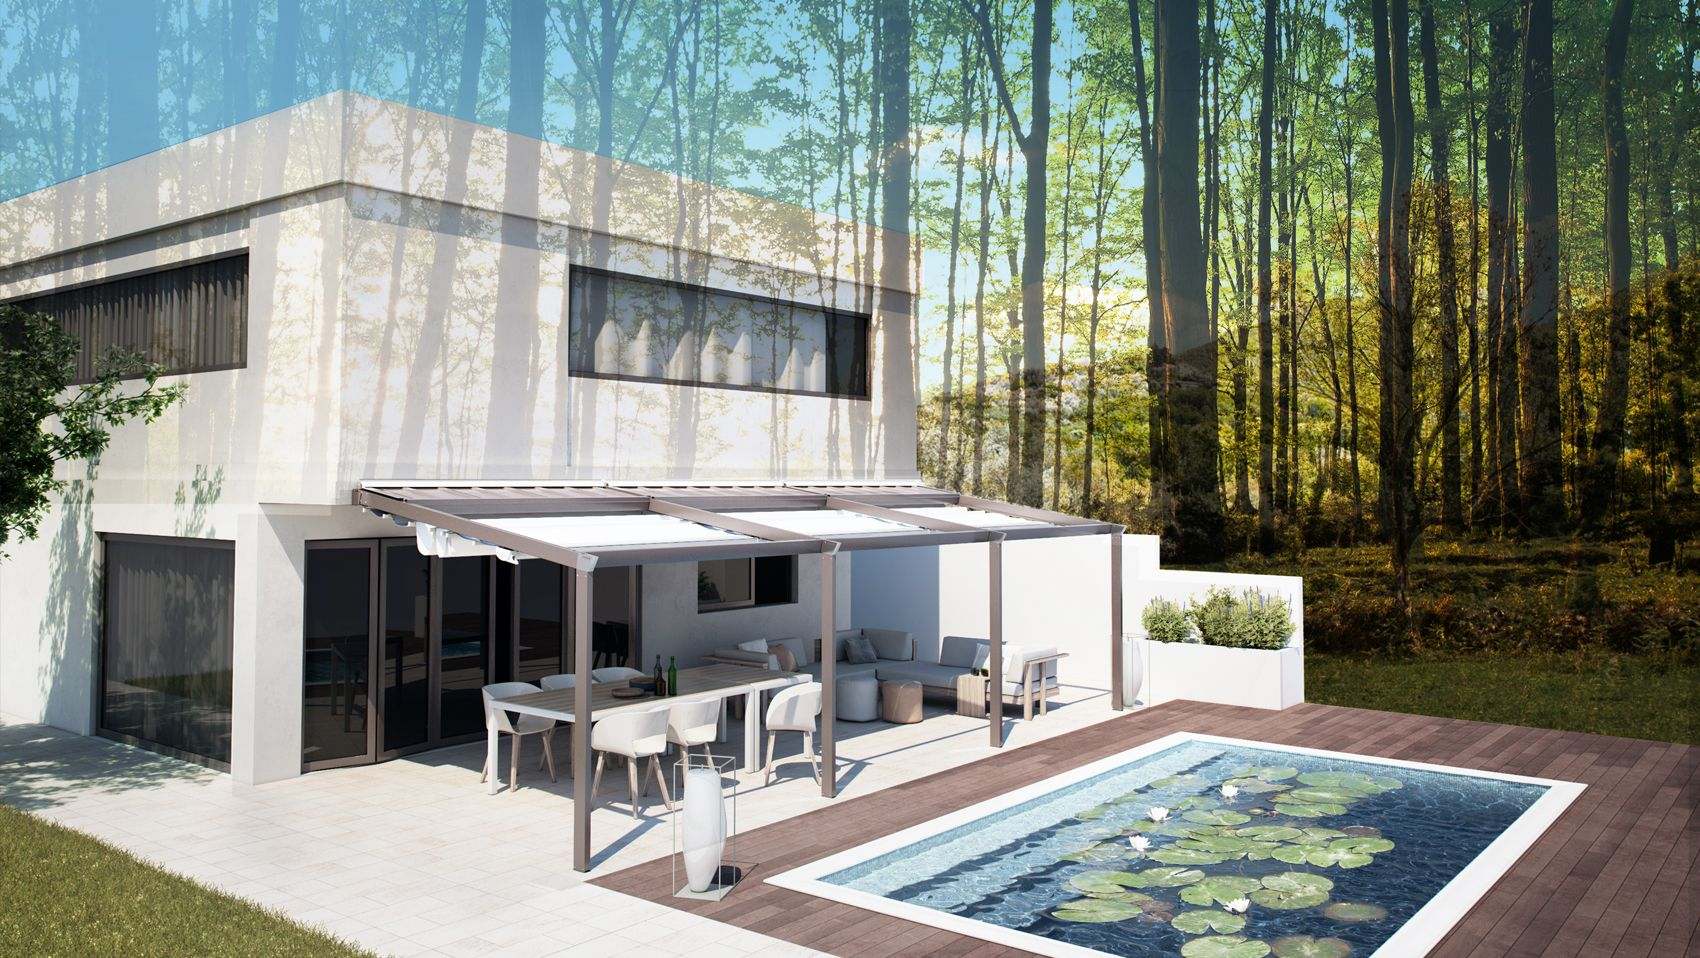 Corradi - Outdoor Living Space | Outdoor furniture design ... on Corradi Living Space id=87677